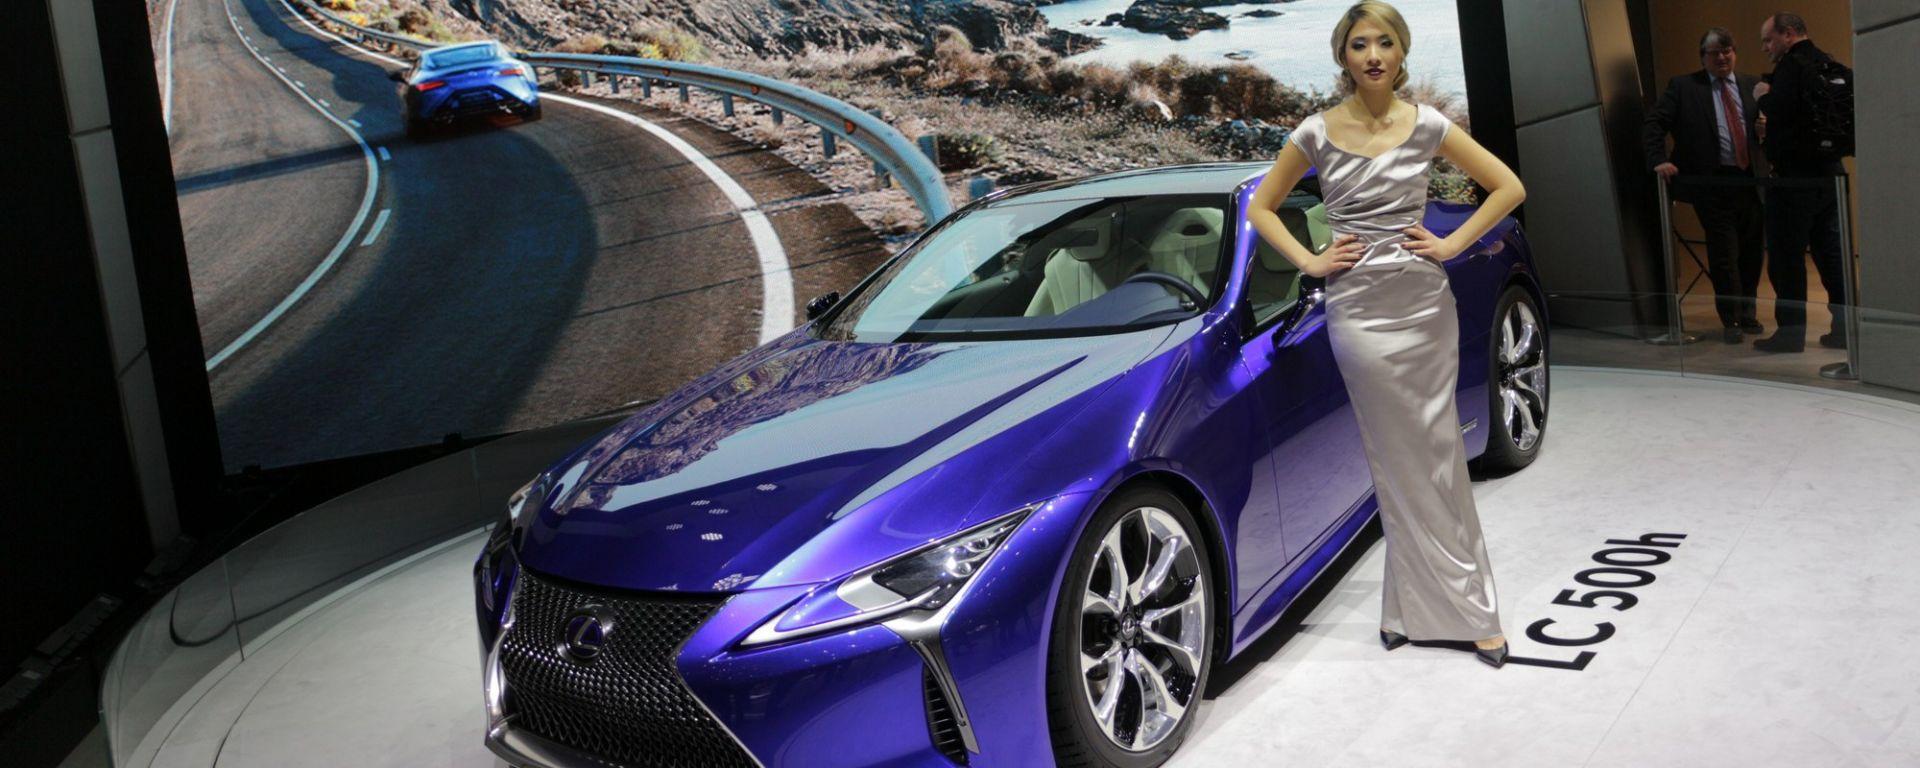 Ginevra 2016: Lexus LC 500h e LF-FC